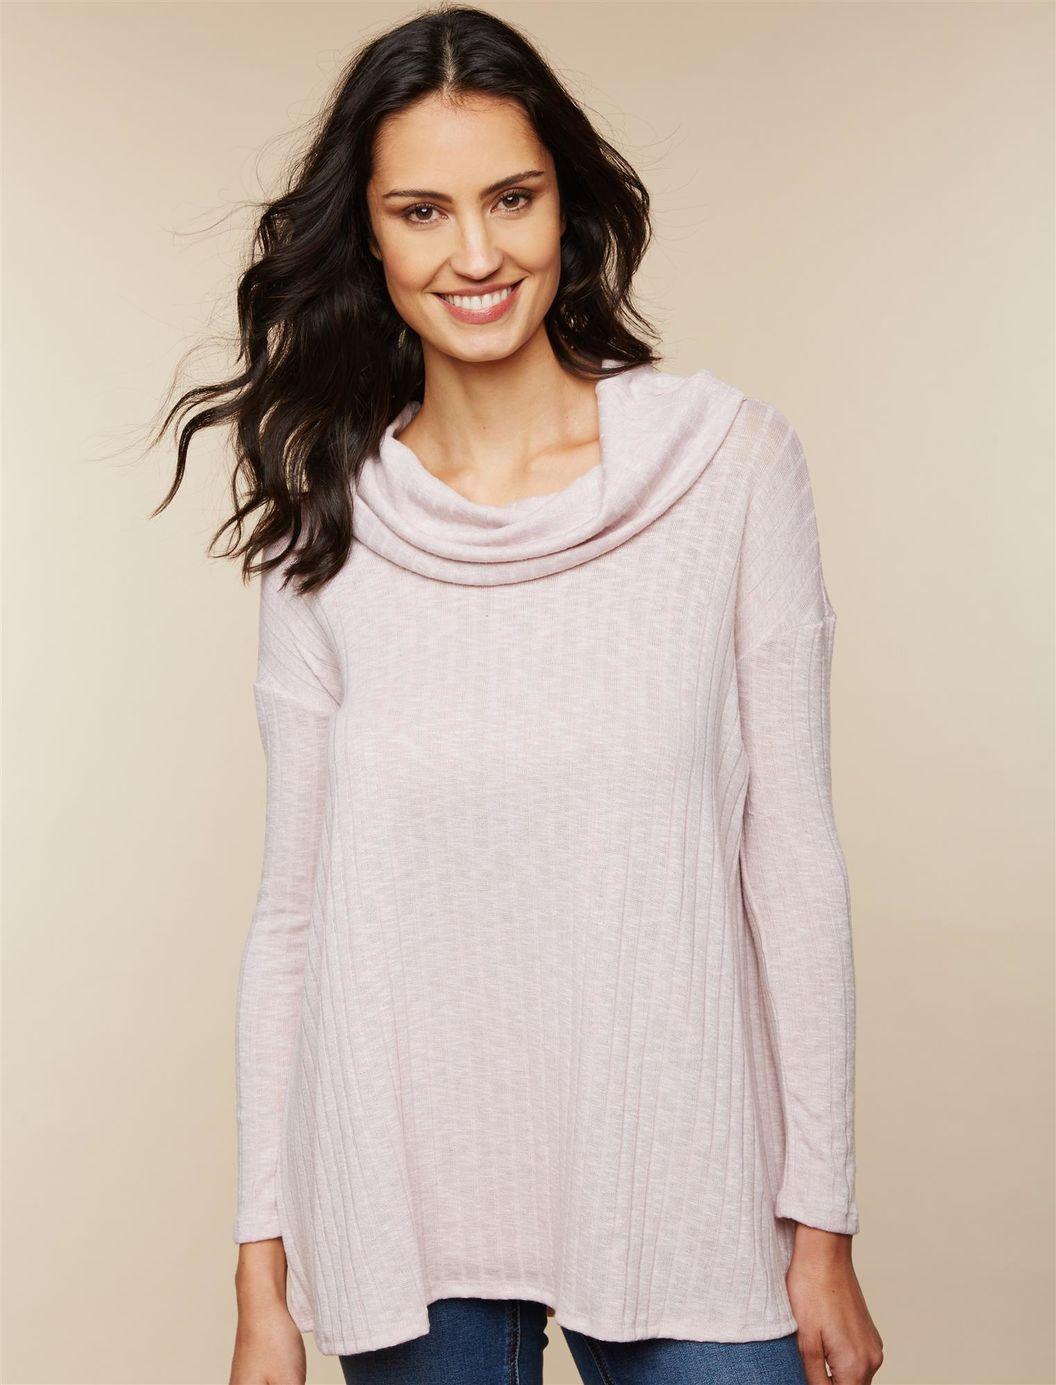 Breastfeeding dresses for weddings  Side Access Side Slit Nursing Top Pink  Wish list  Pinterest